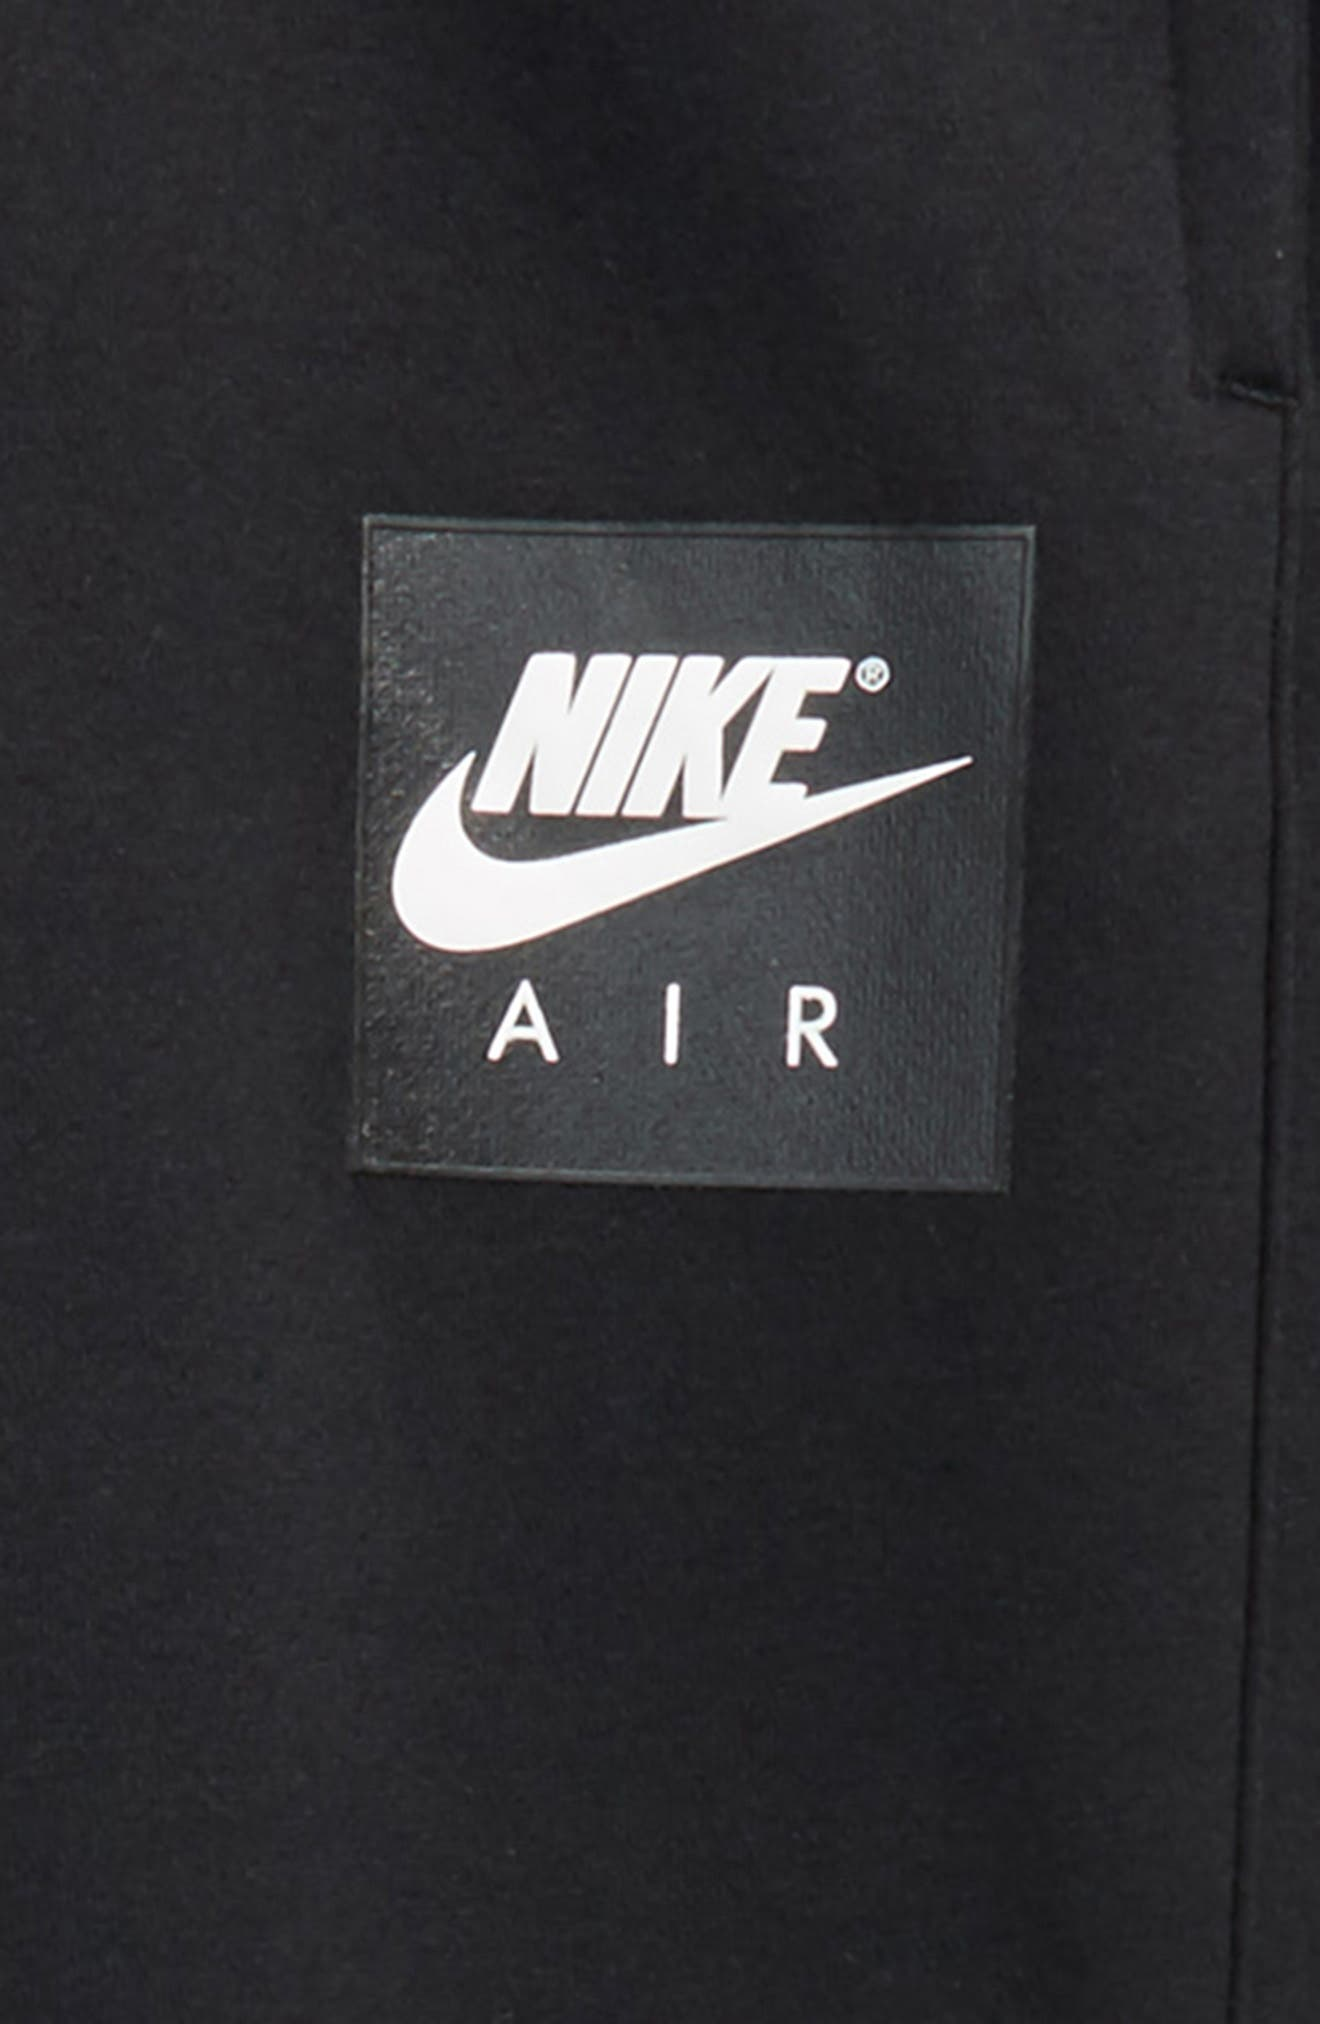 Air Sweatpants,                             Alternate thumbnail 2, color,                             Black/ White